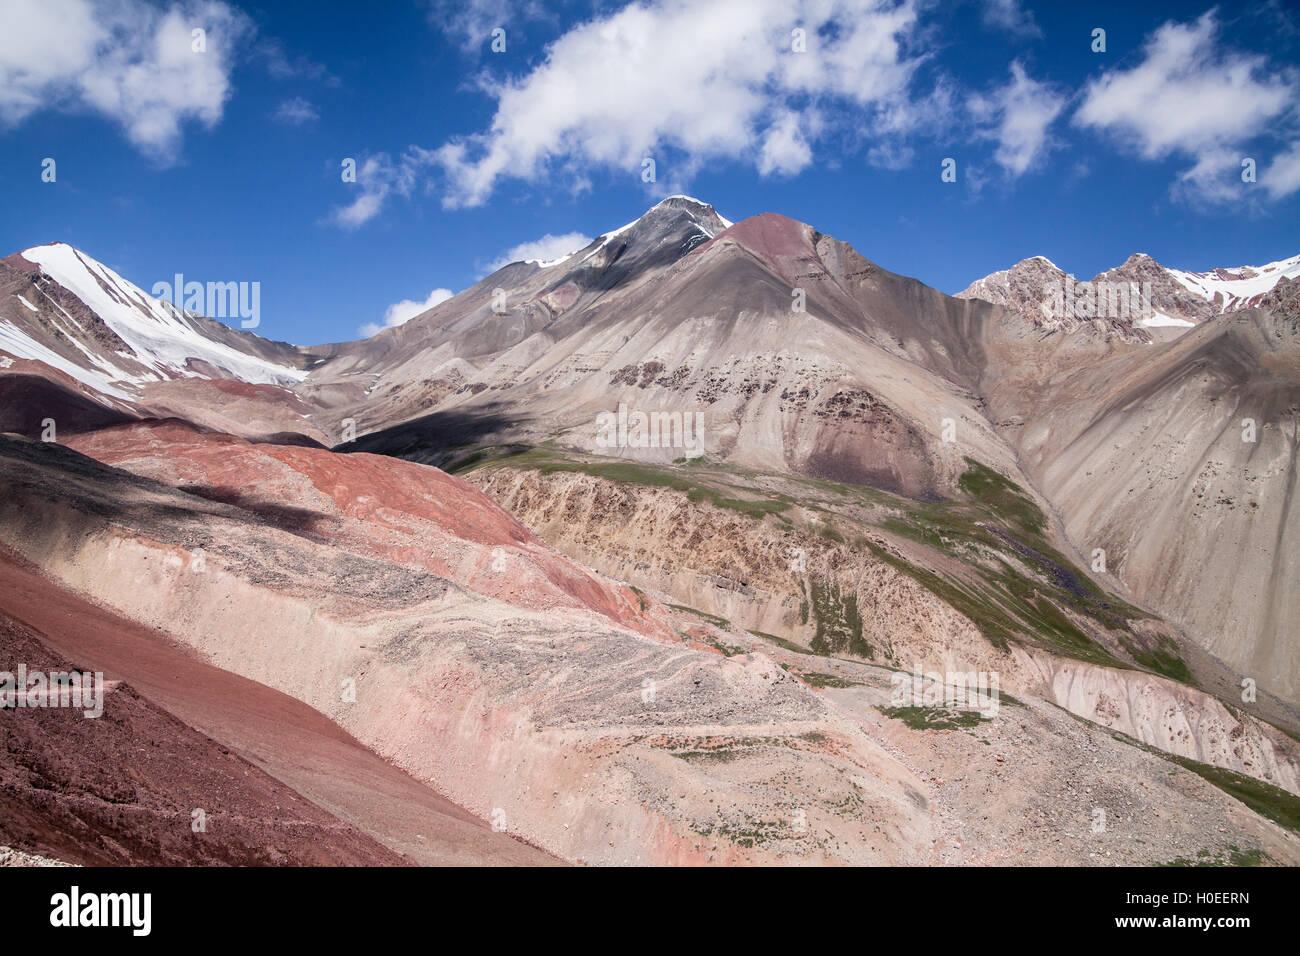 Beautiful view of Pamir mountains near the Lenin peak, Kyrgyzstan - Stock Image